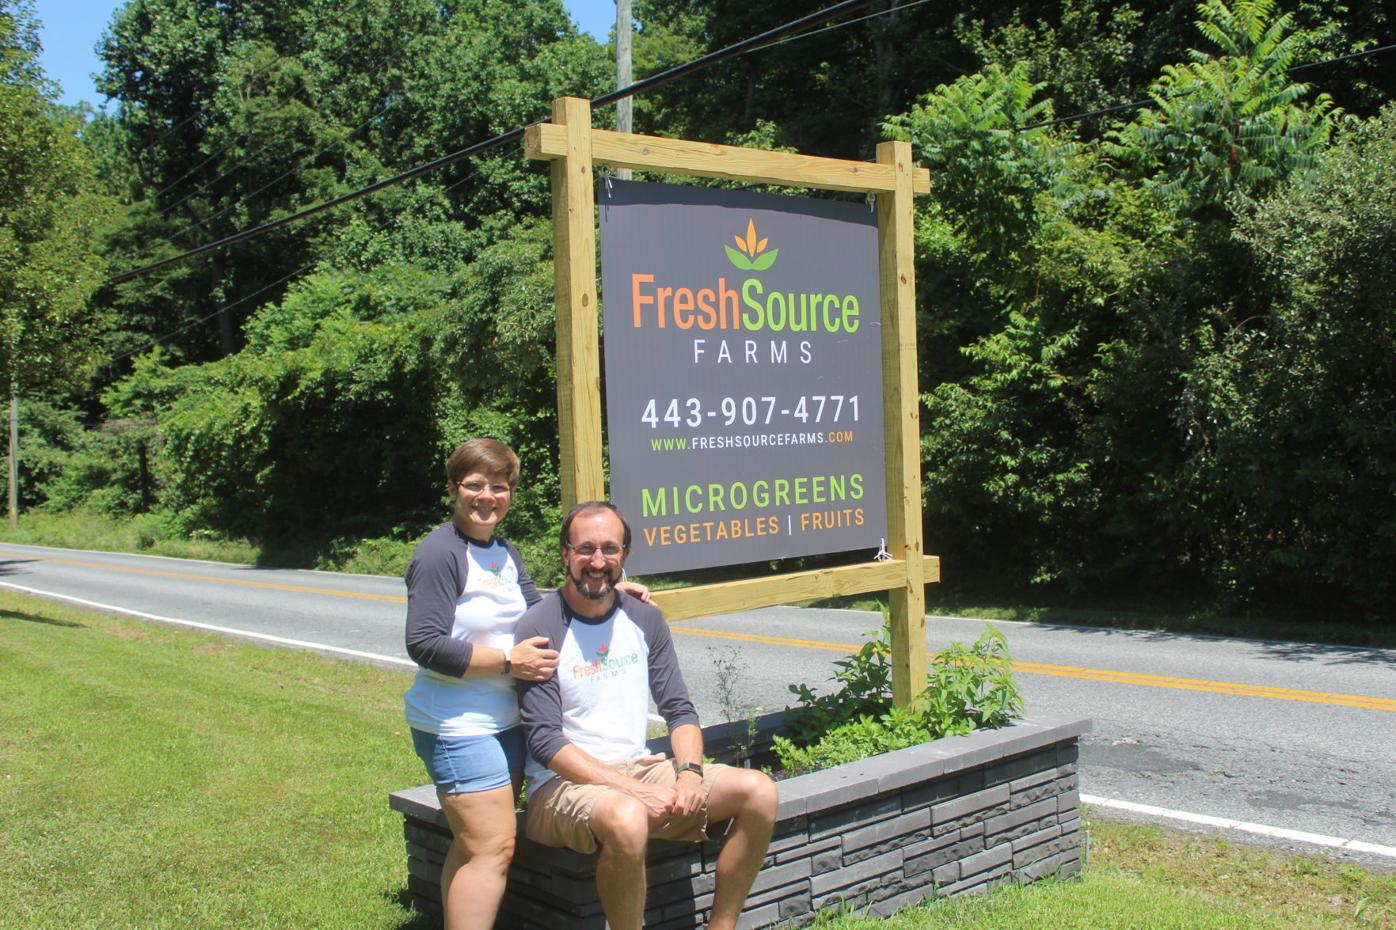 FreshSource Farms joining the farmer's market venues